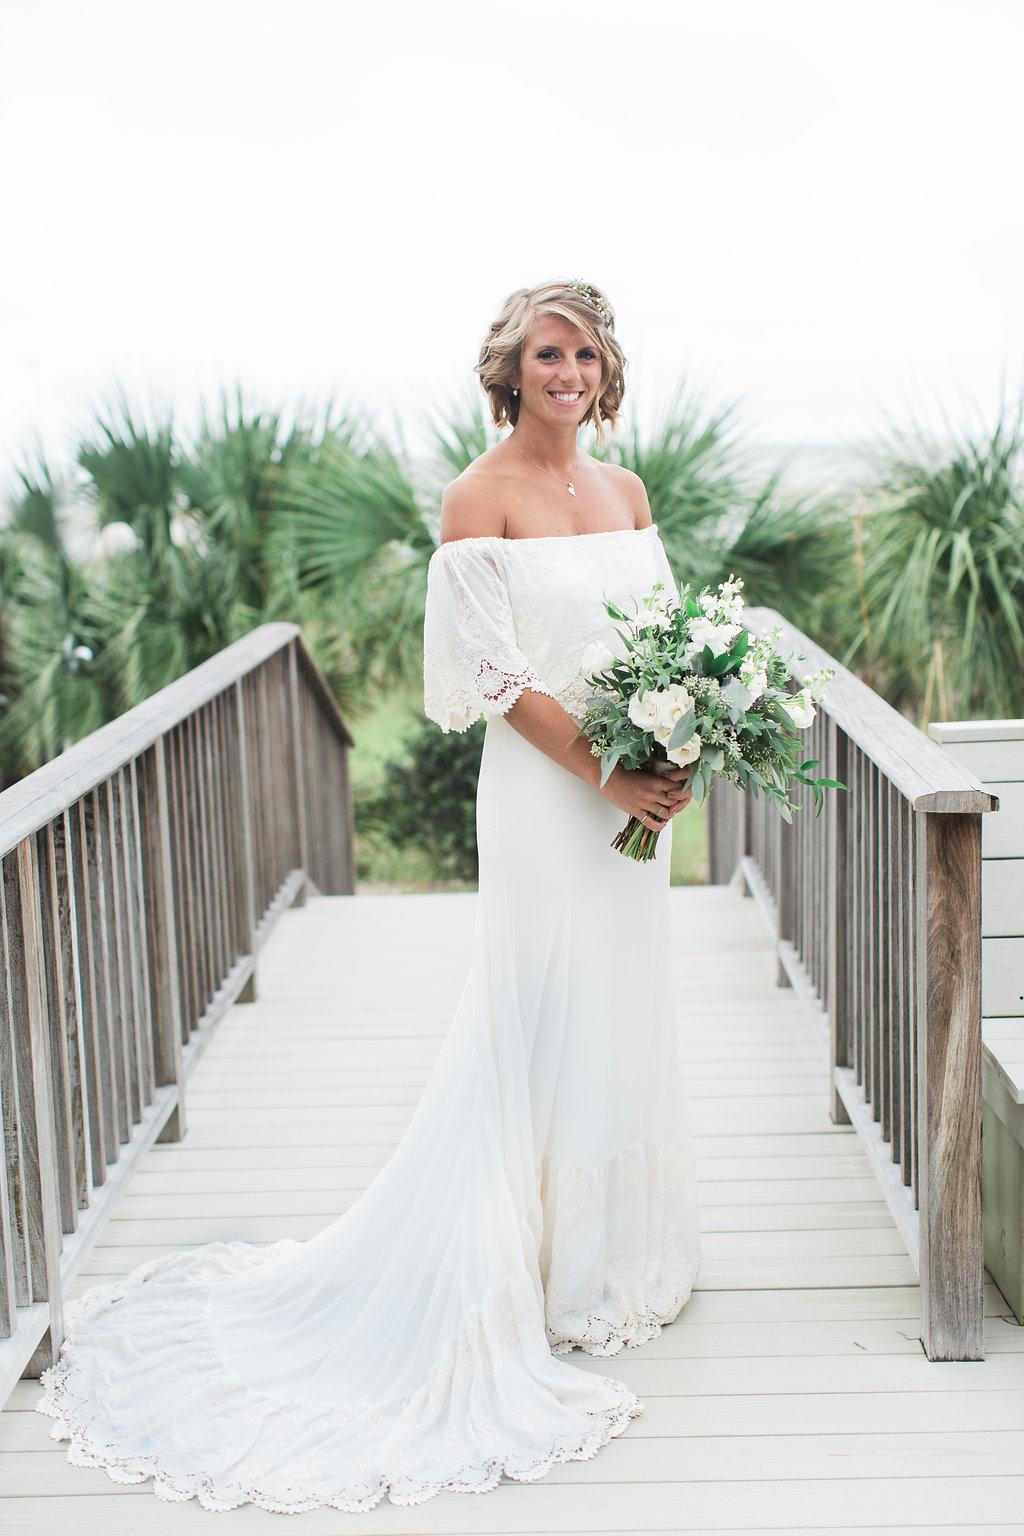 stacey-and-tj-wedding-apartment-b-photography-ivory-and-beau-bridal-boutique-savannah-wedding-dresses-daughters-of-simone-lu-boho-bride-boho-wedding-savannah-boho-wedding-savannah-weddings-savannah-bridal-gowns-savannah-wedding-19.jpg